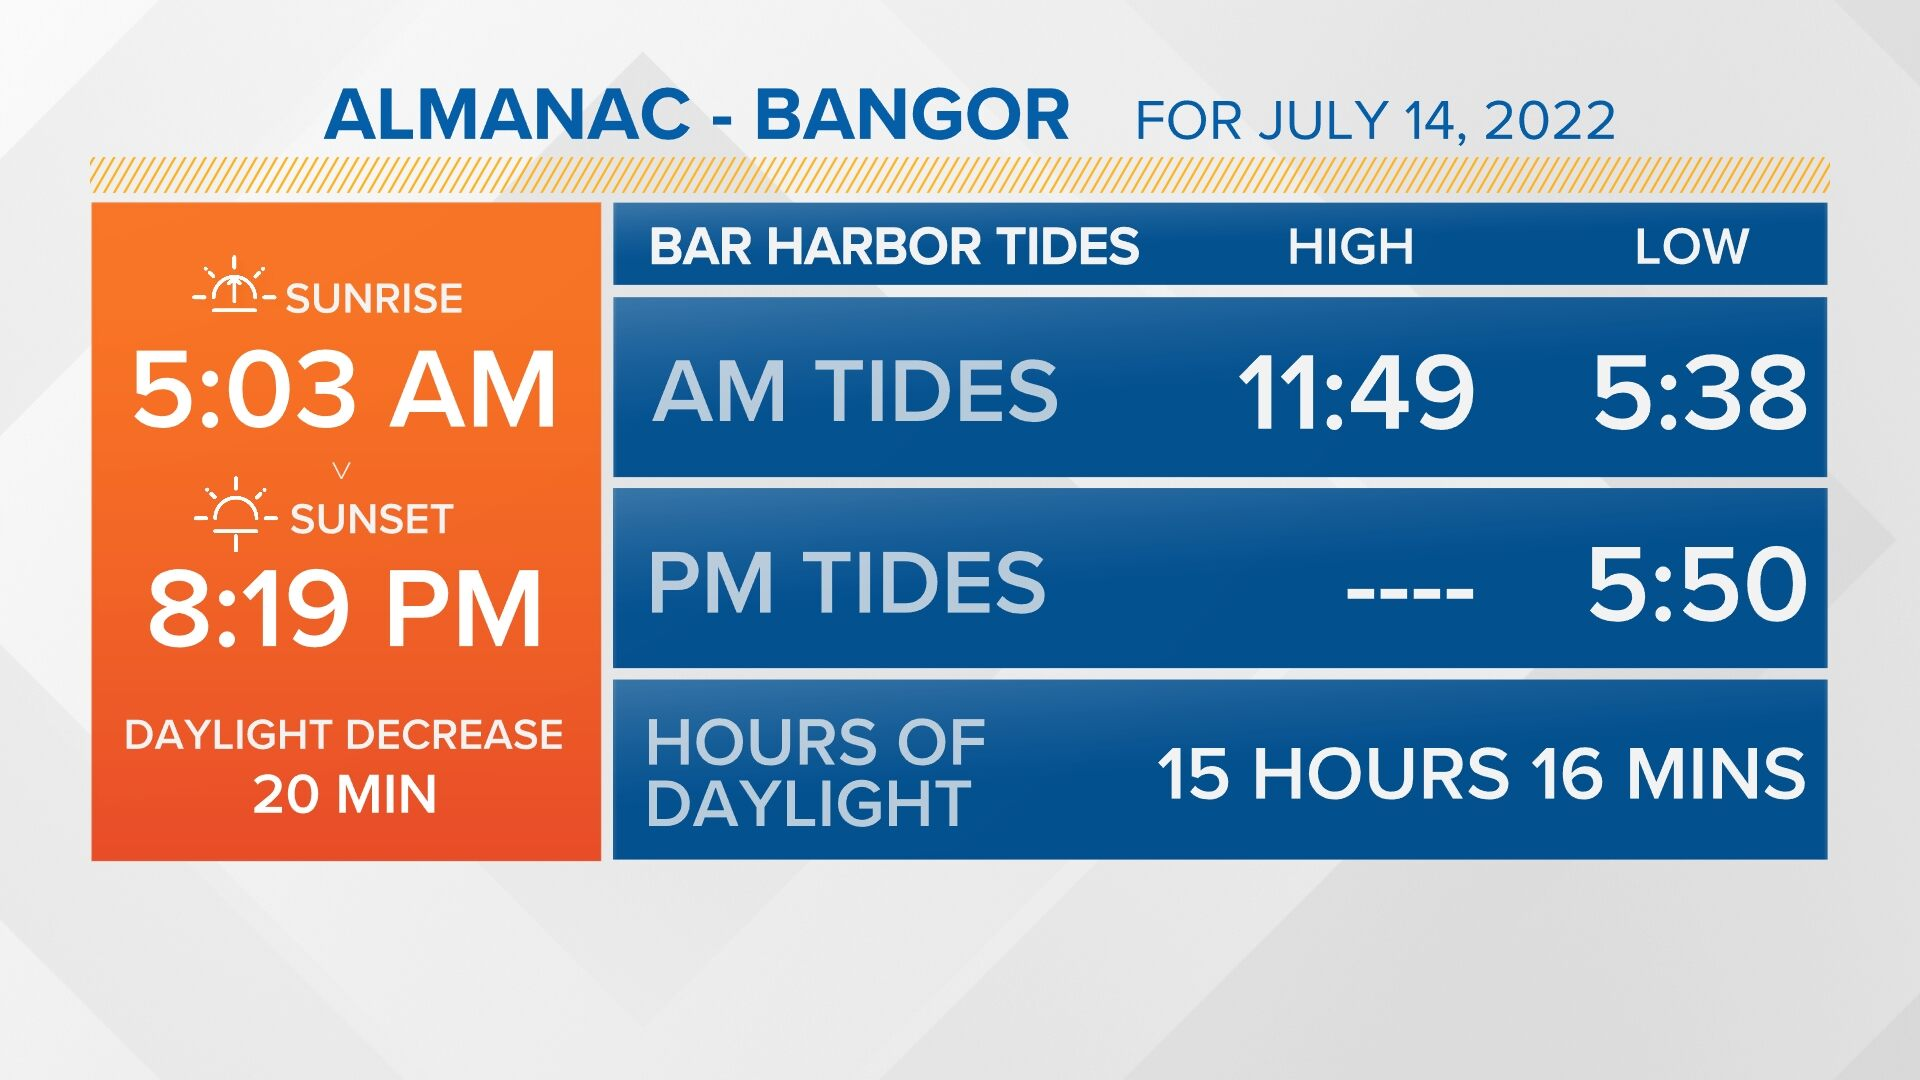 Bangor Almanac